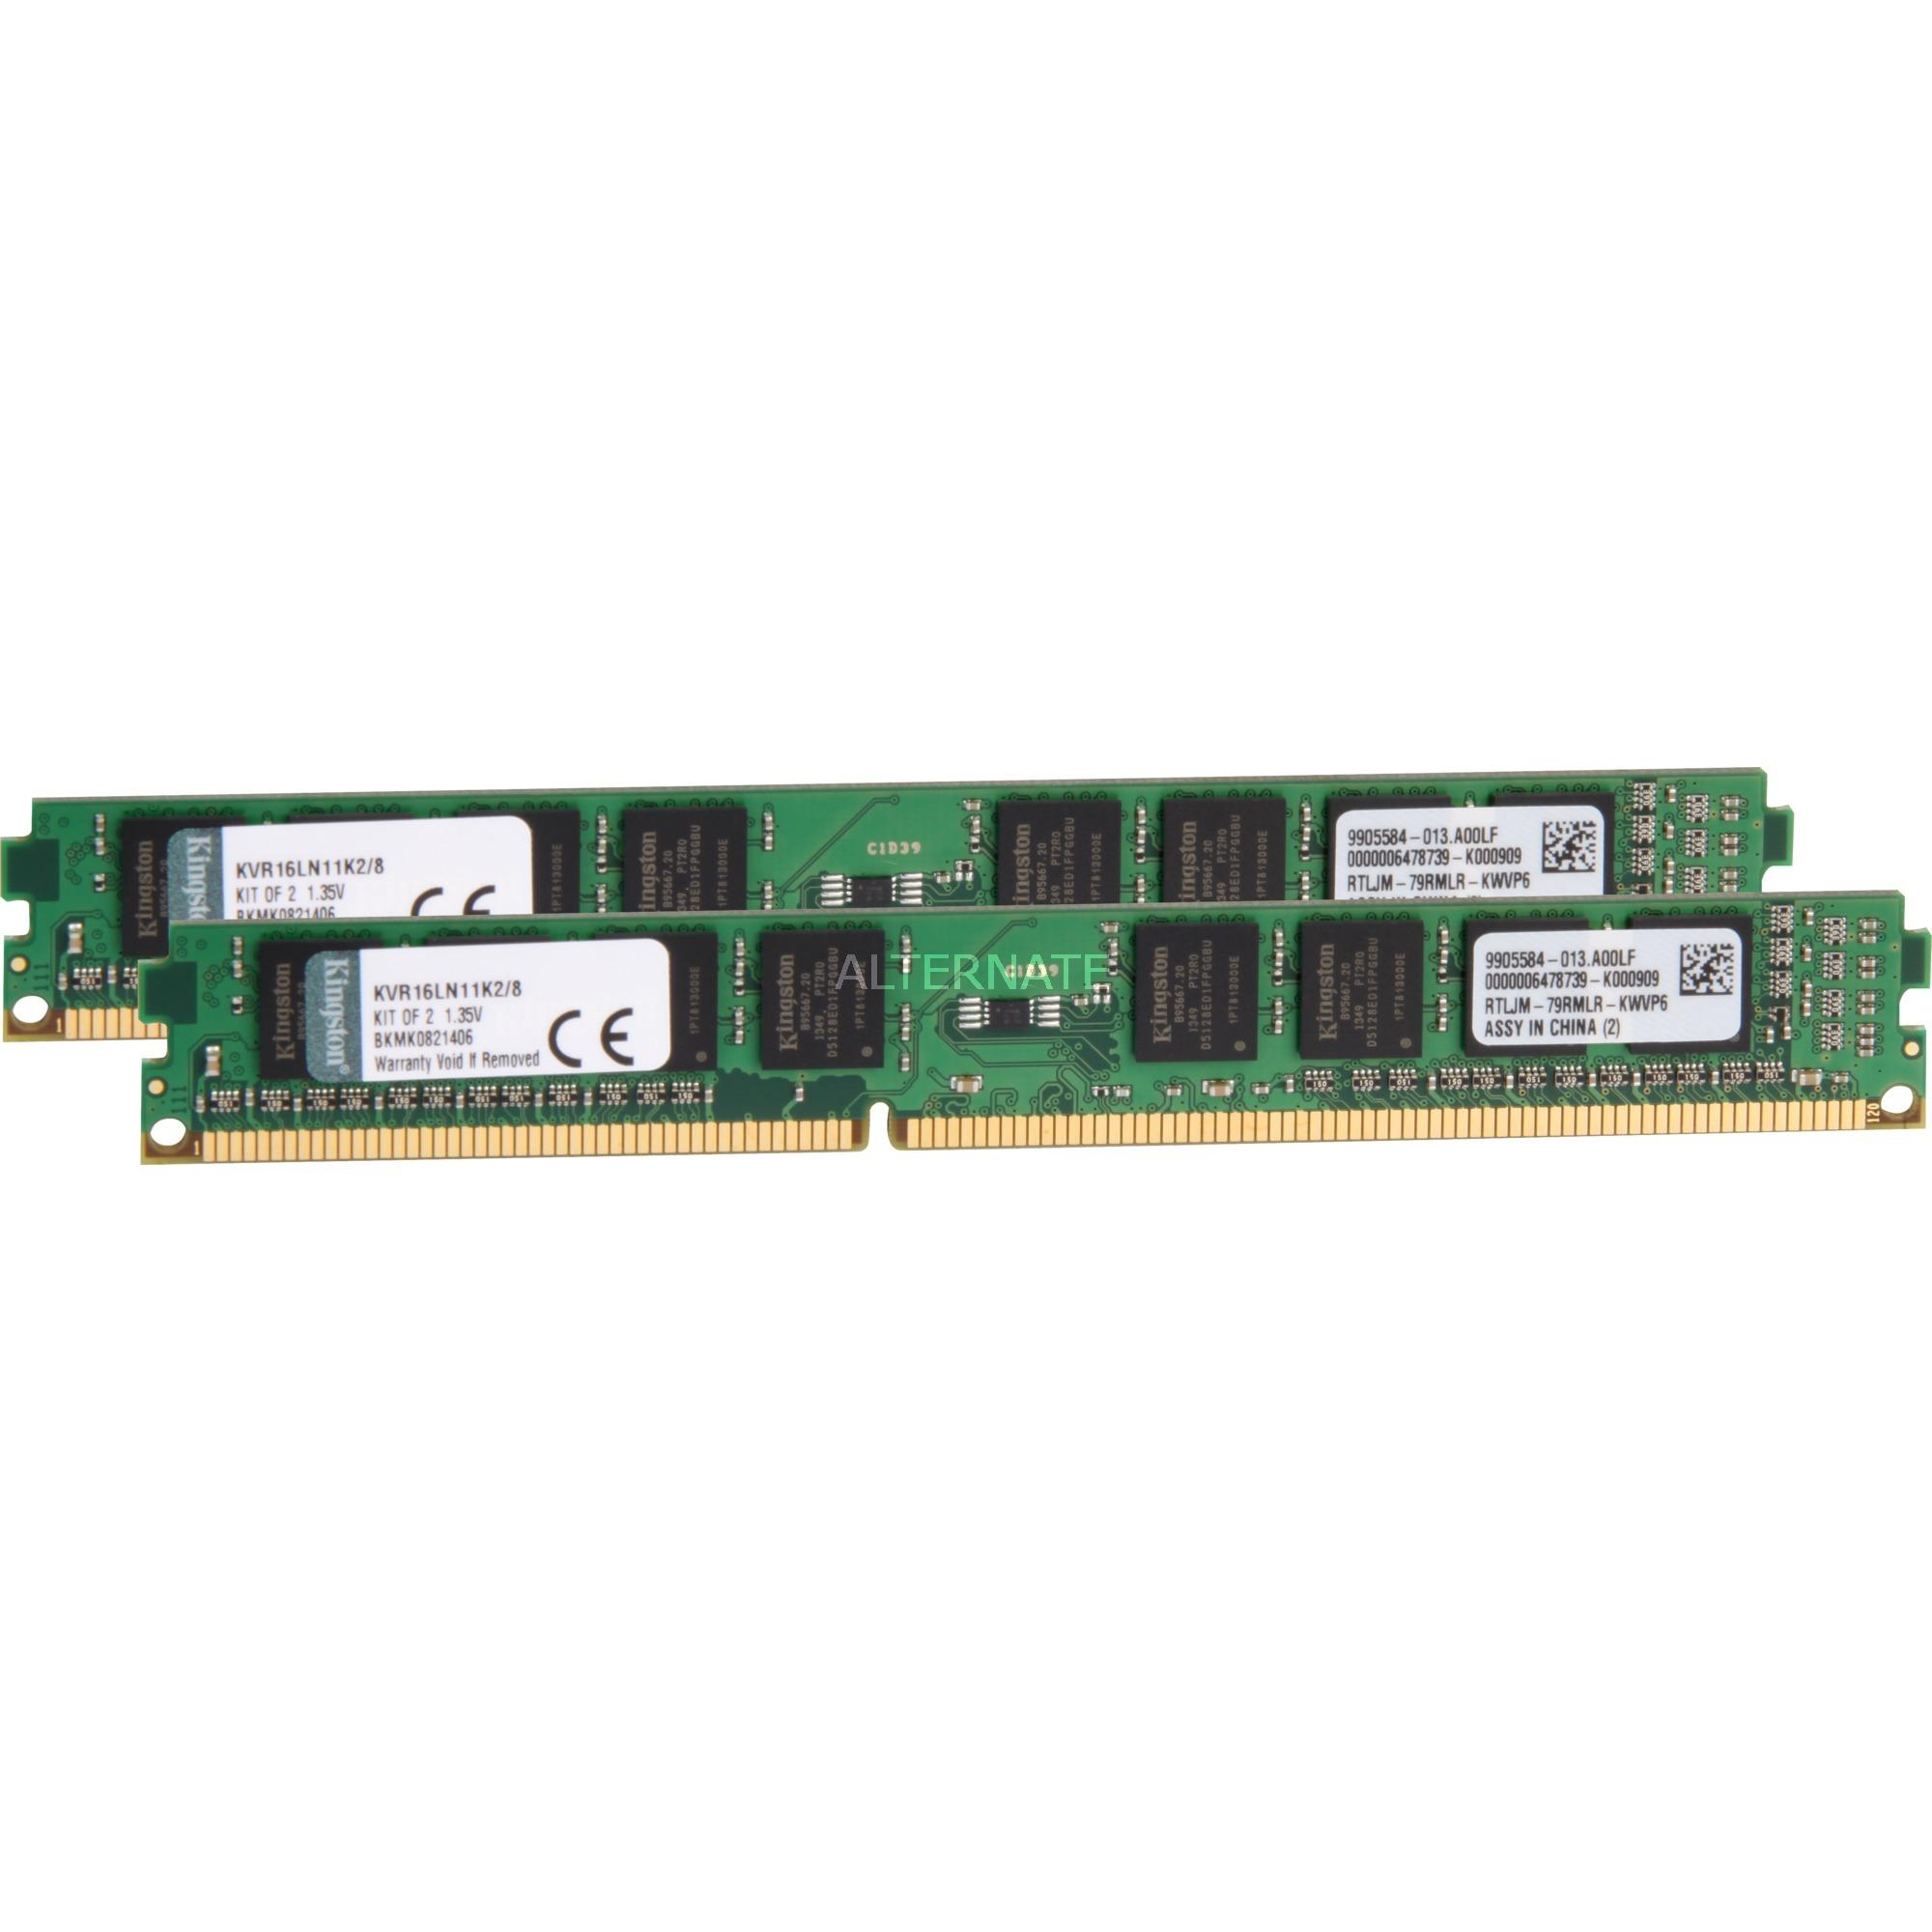 System Specific Memory 8GB DDR3-1600 módulo de memoria DDR3L 1600 MHz, Memoria RAM